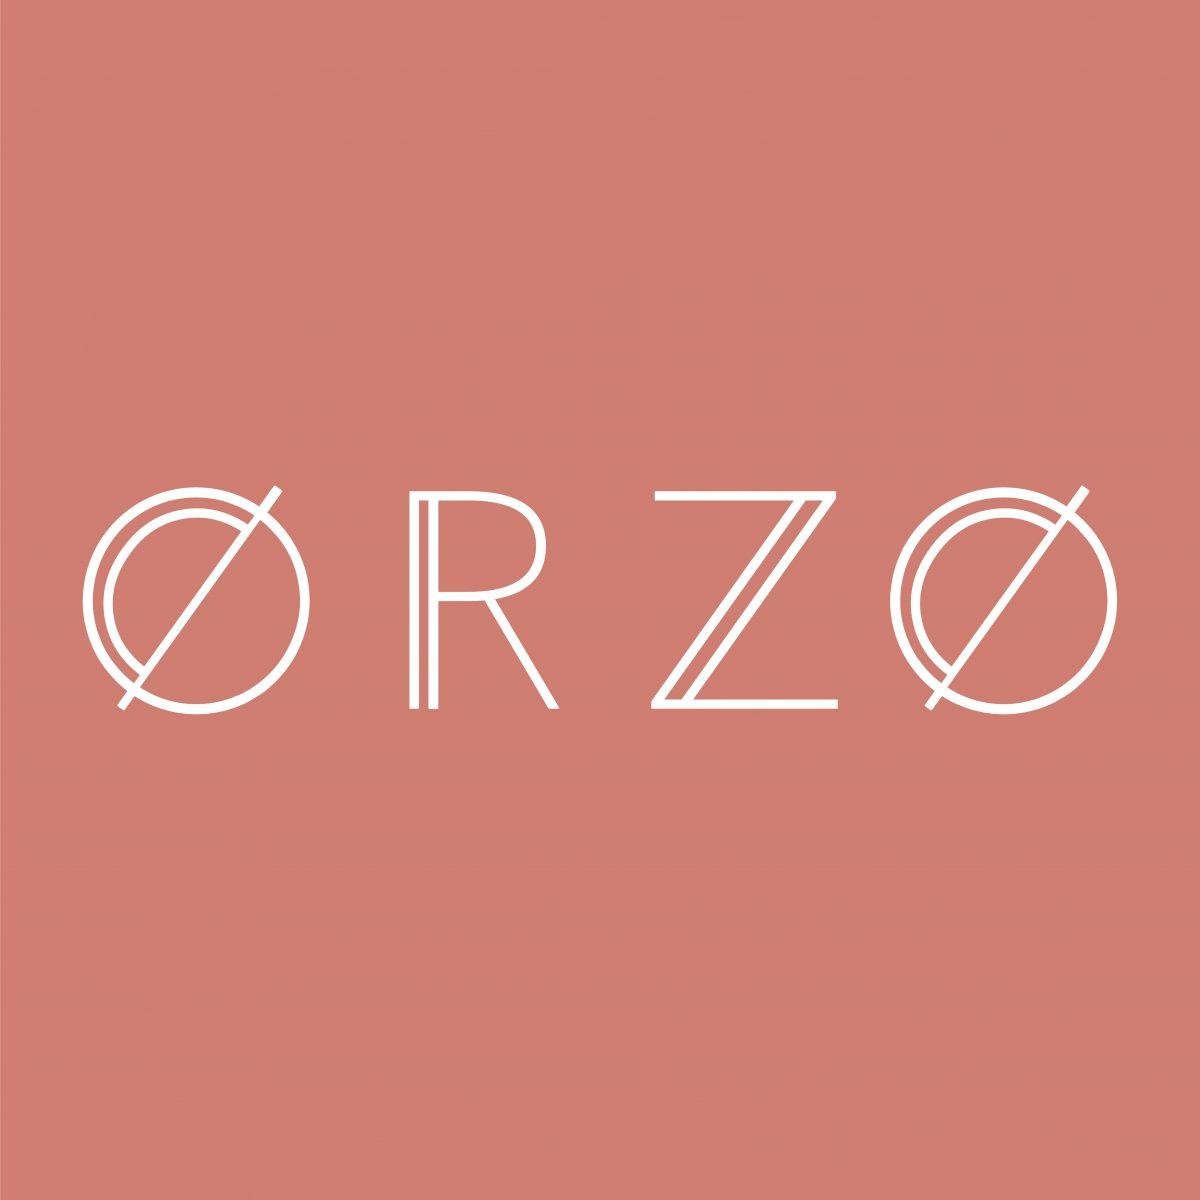 orzo logofiles Landscape White on Nude